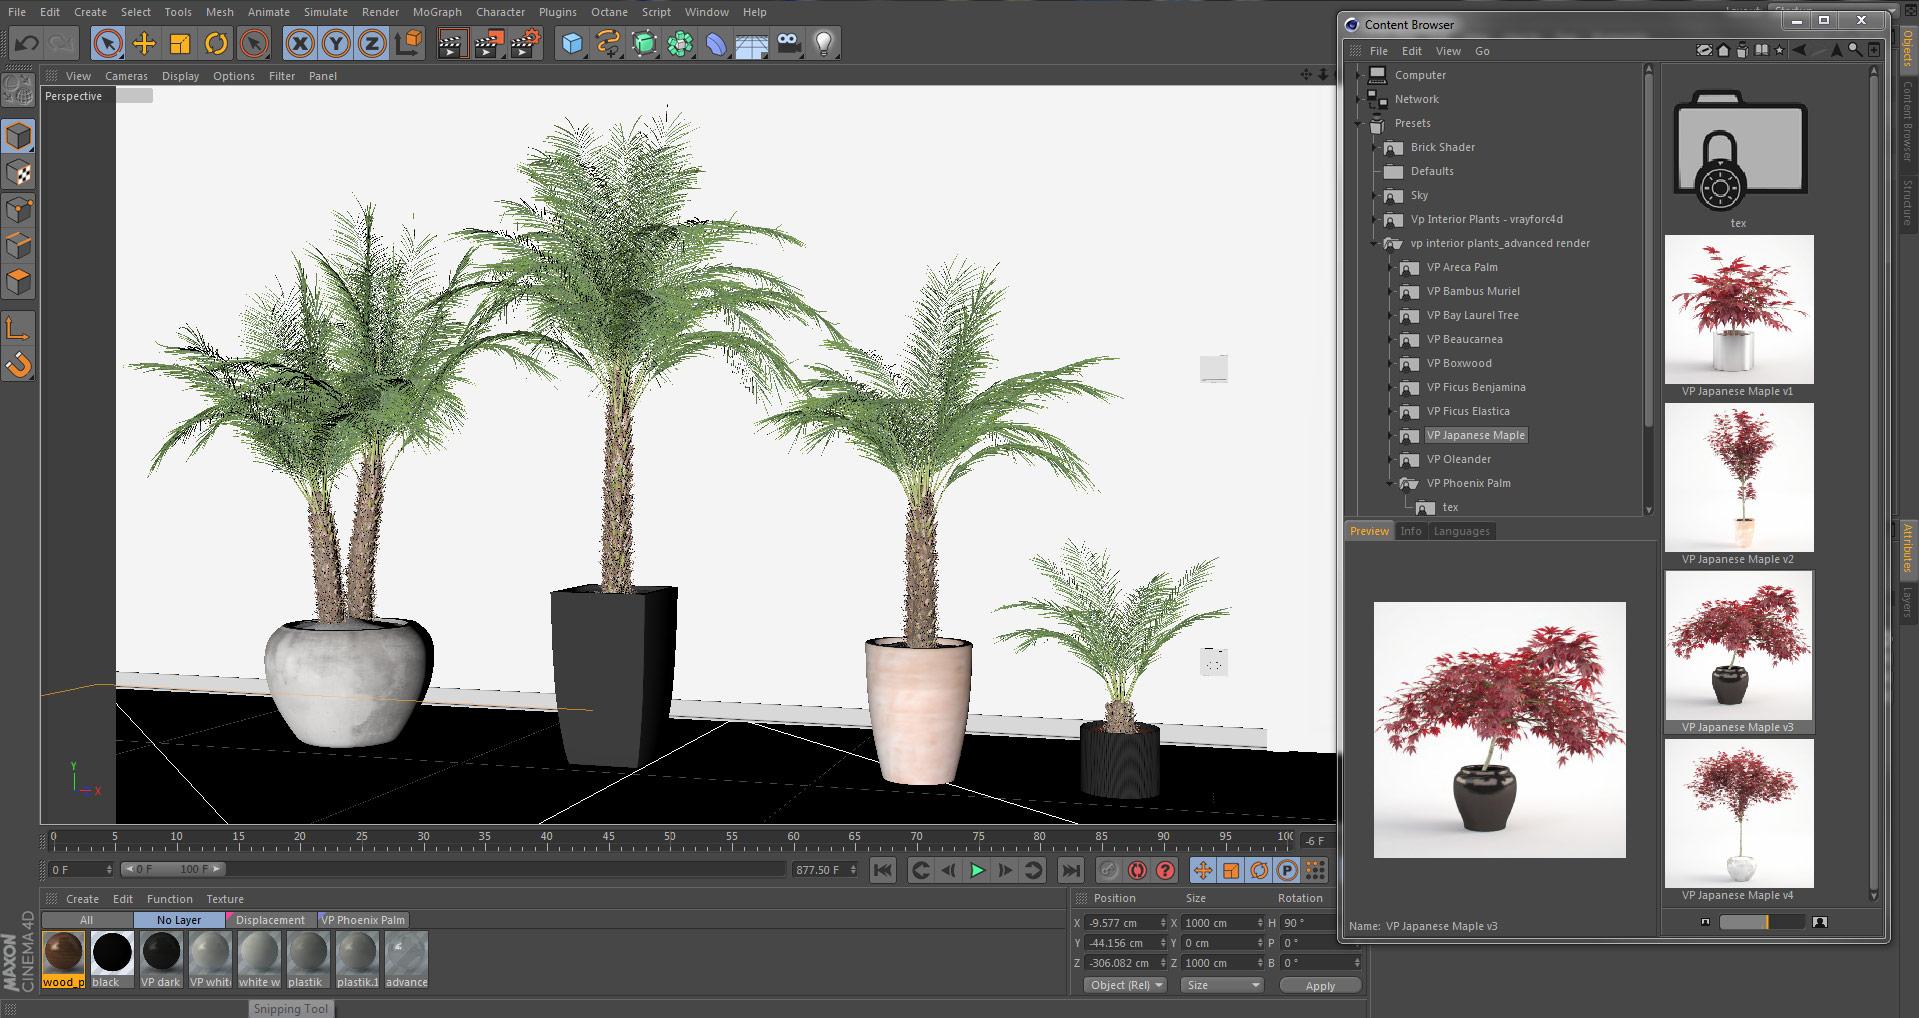 Phoenix Palm (v2) - VIZPARK™